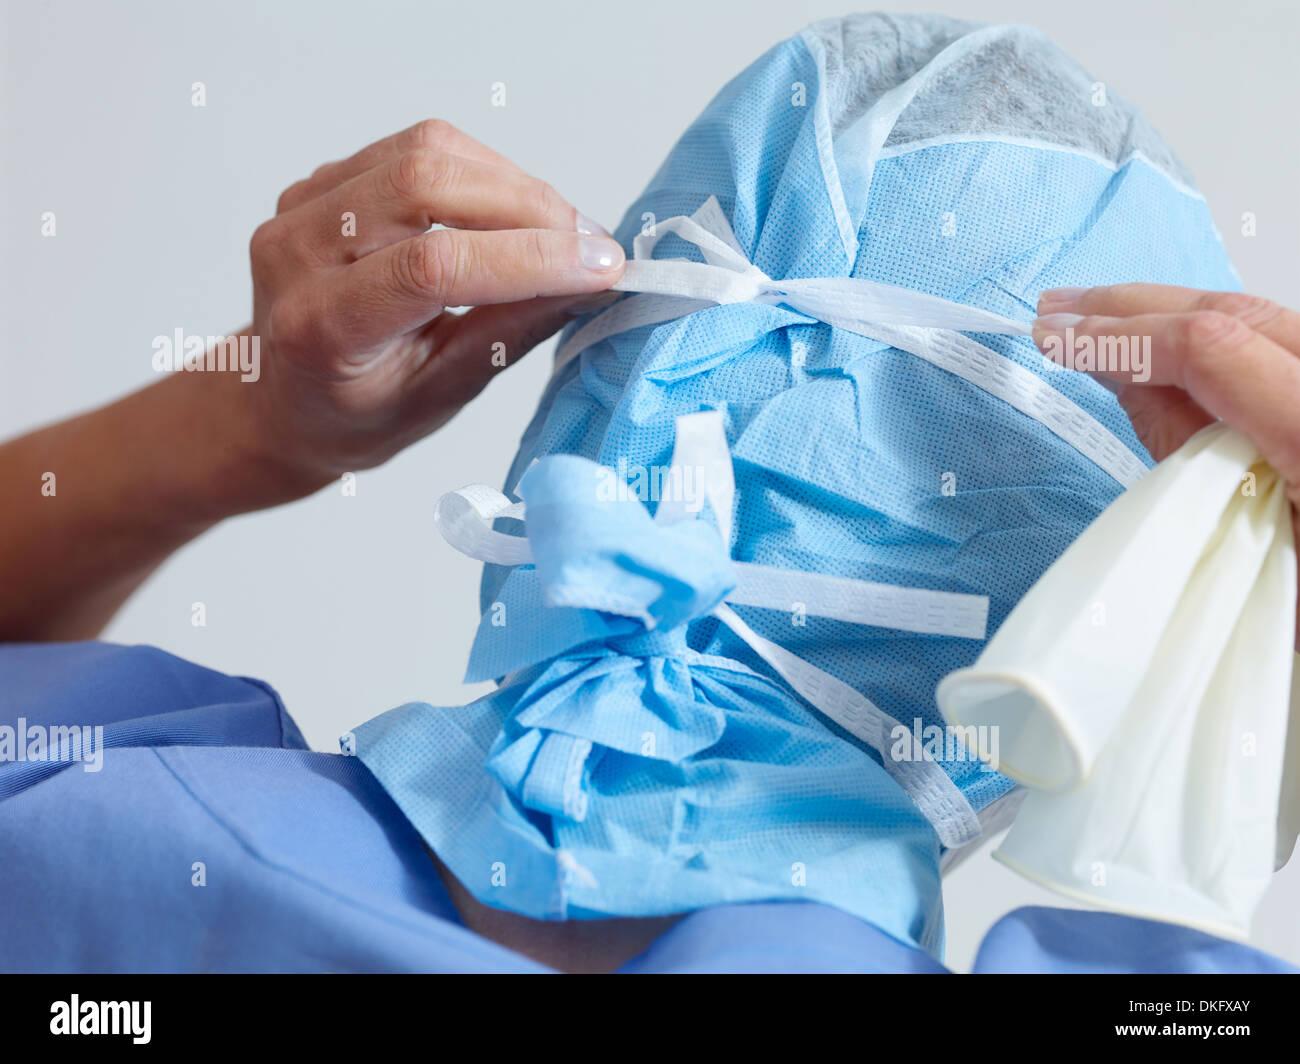 Surgeon putting on surgical mask - Stock Image